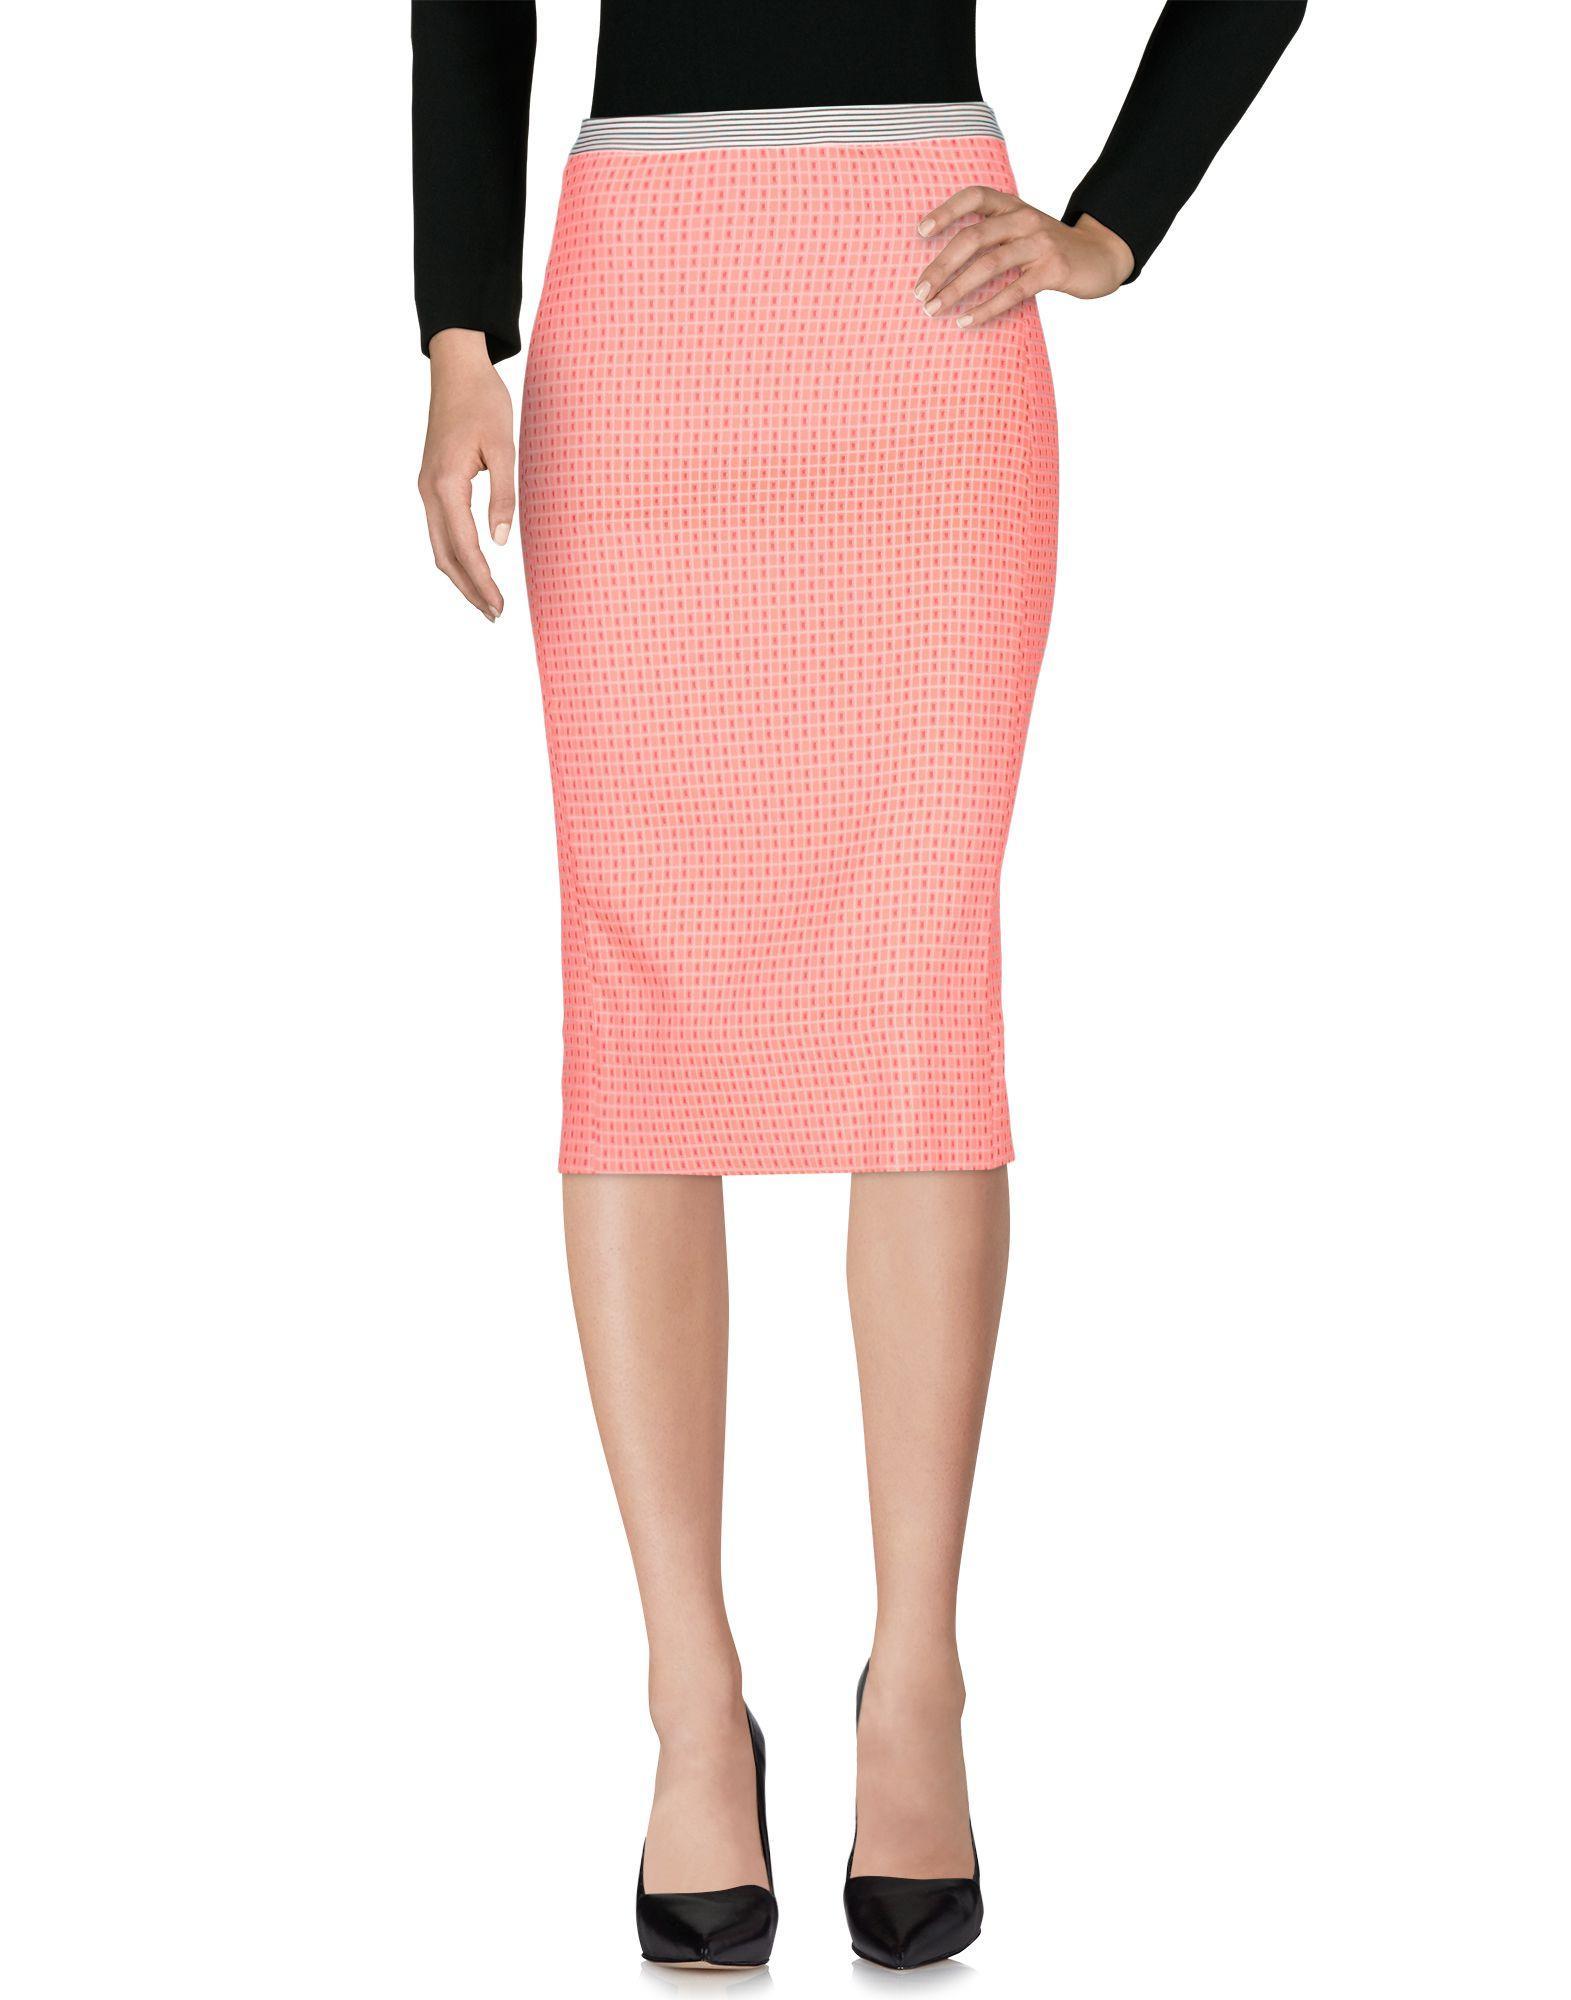 Teresa Dainelli Midi Skirts In Fuchsia